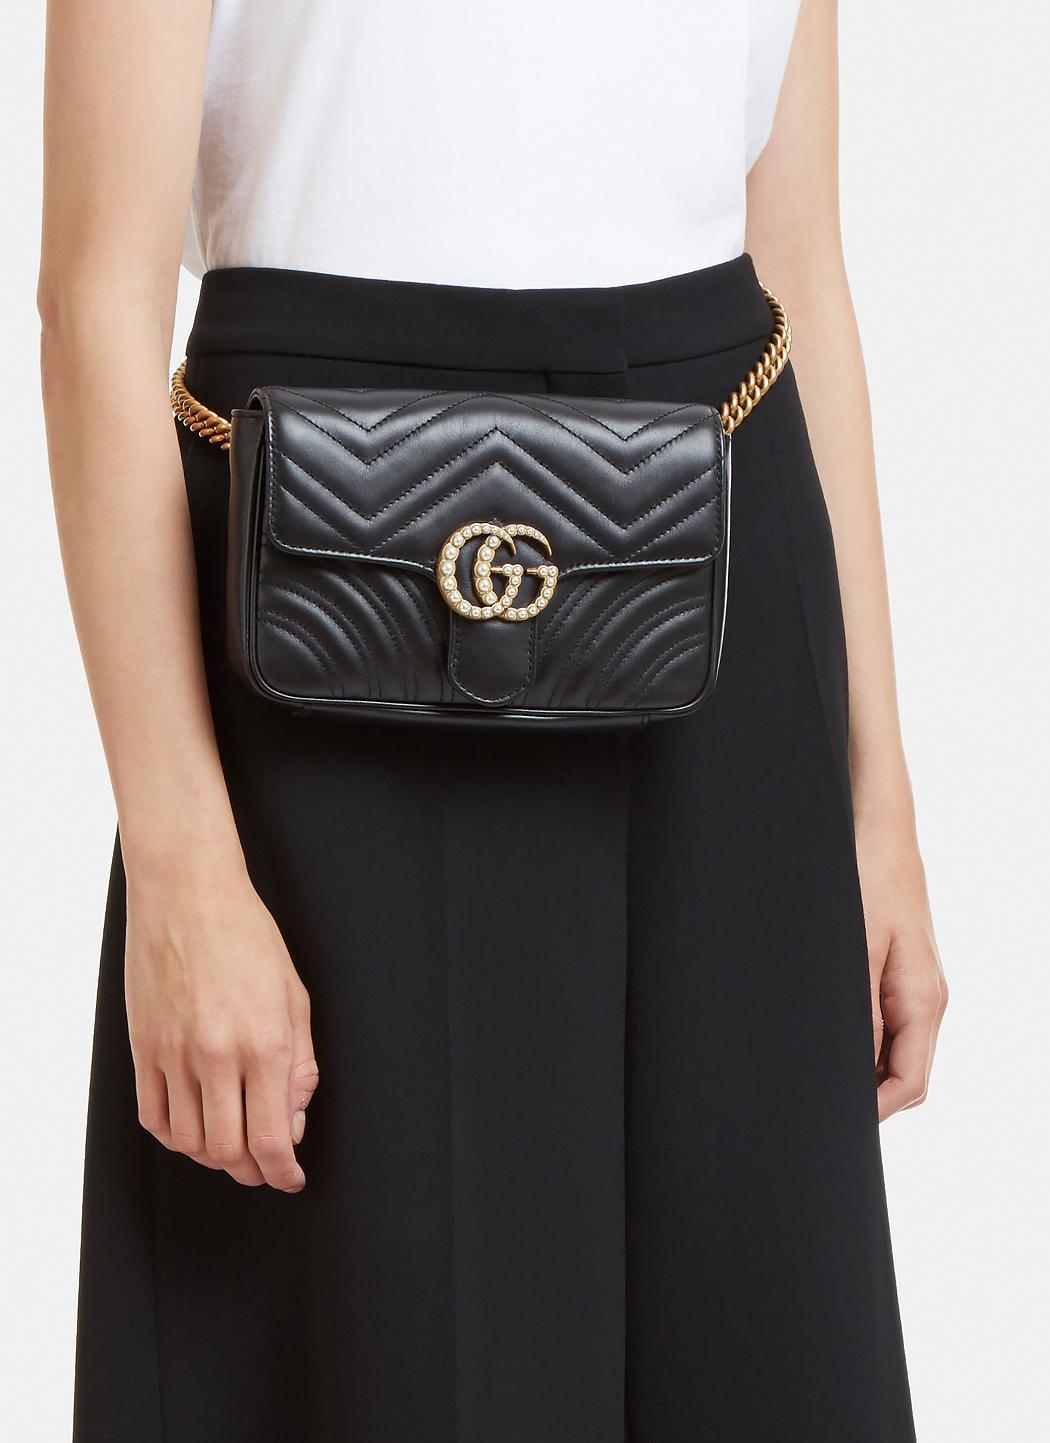 4c24203e876 Lyst - Gucci Marmont 2.0 Gg Pearl Bag In Black in Black